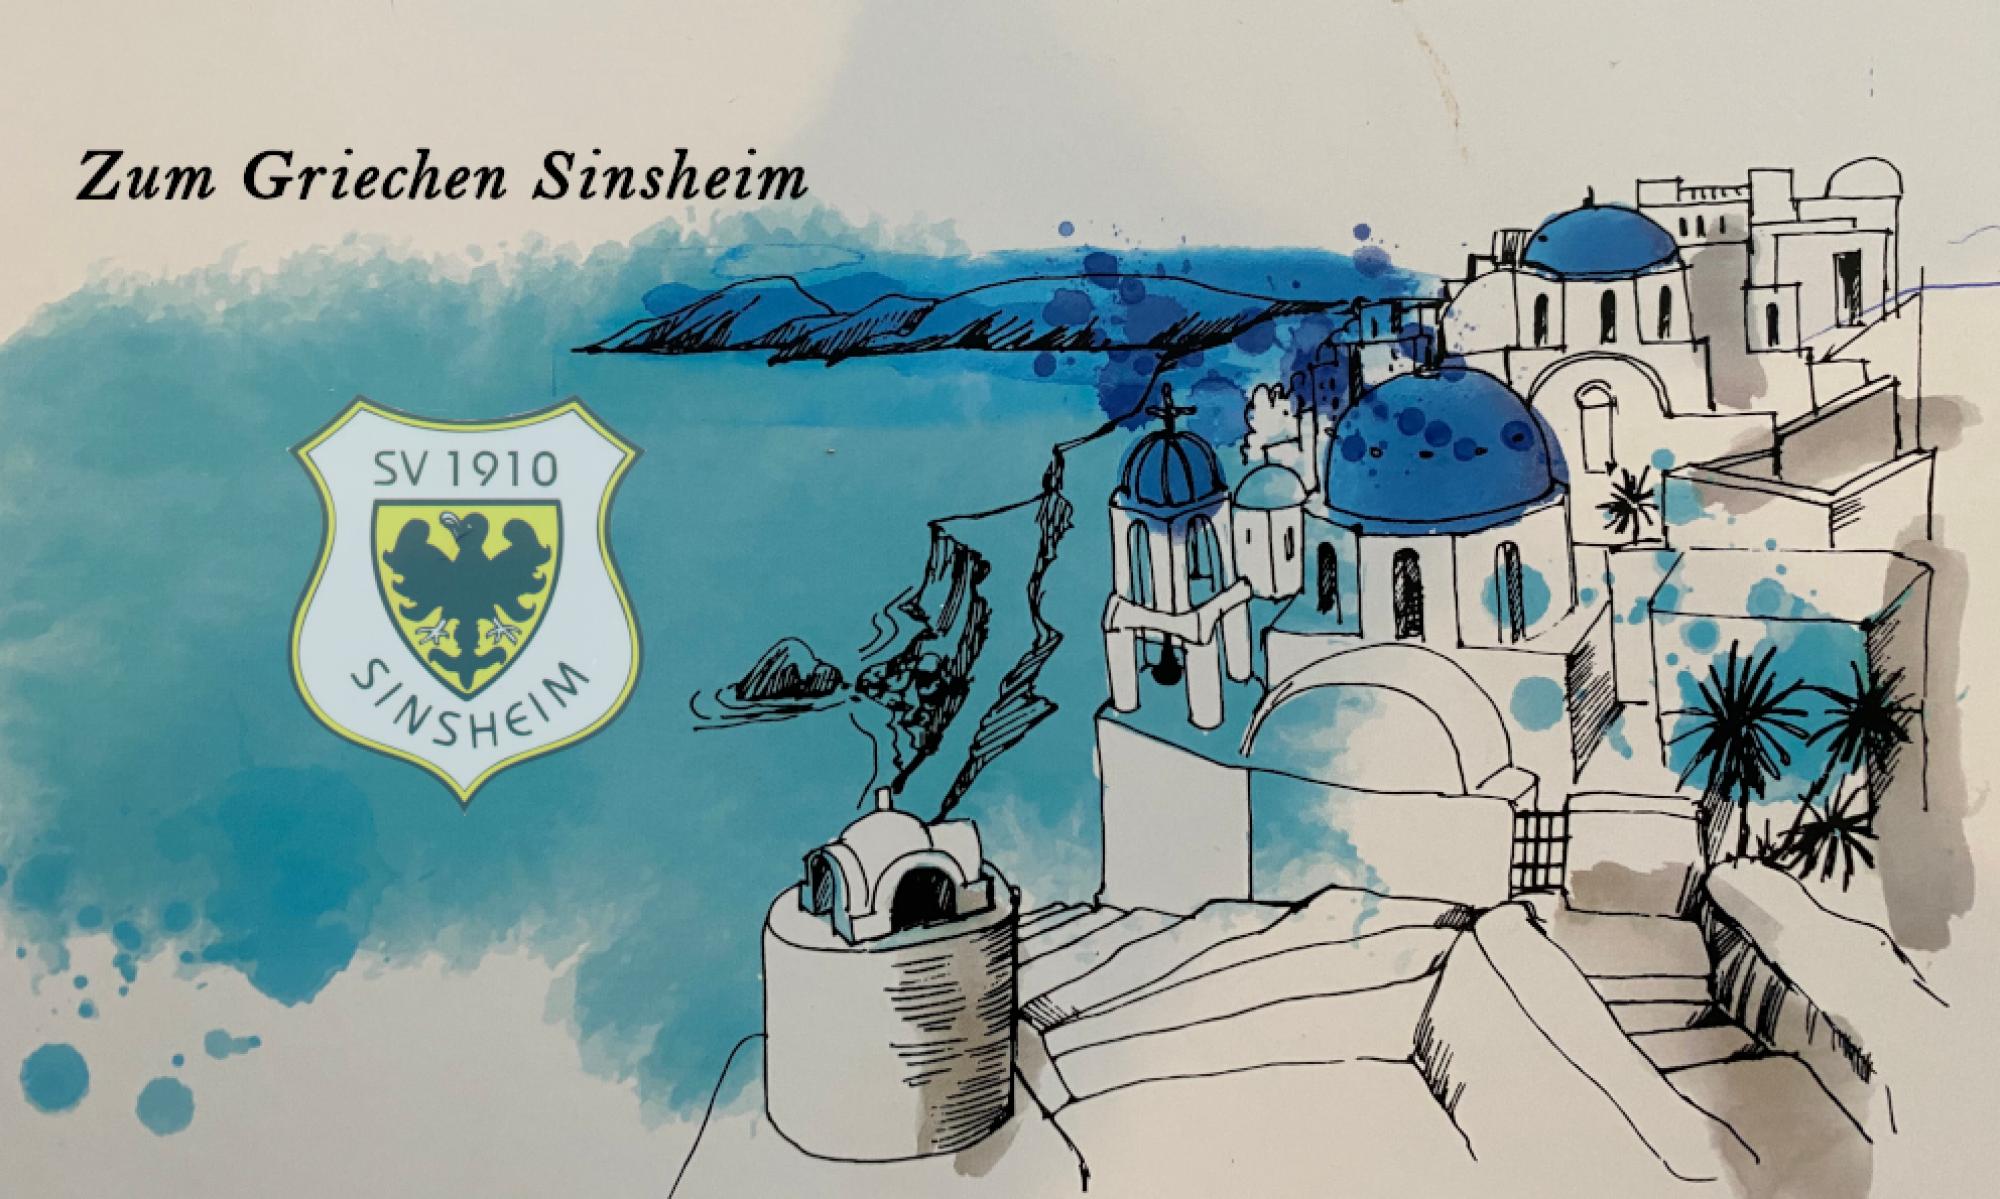 Zum Griechen Sinsheim